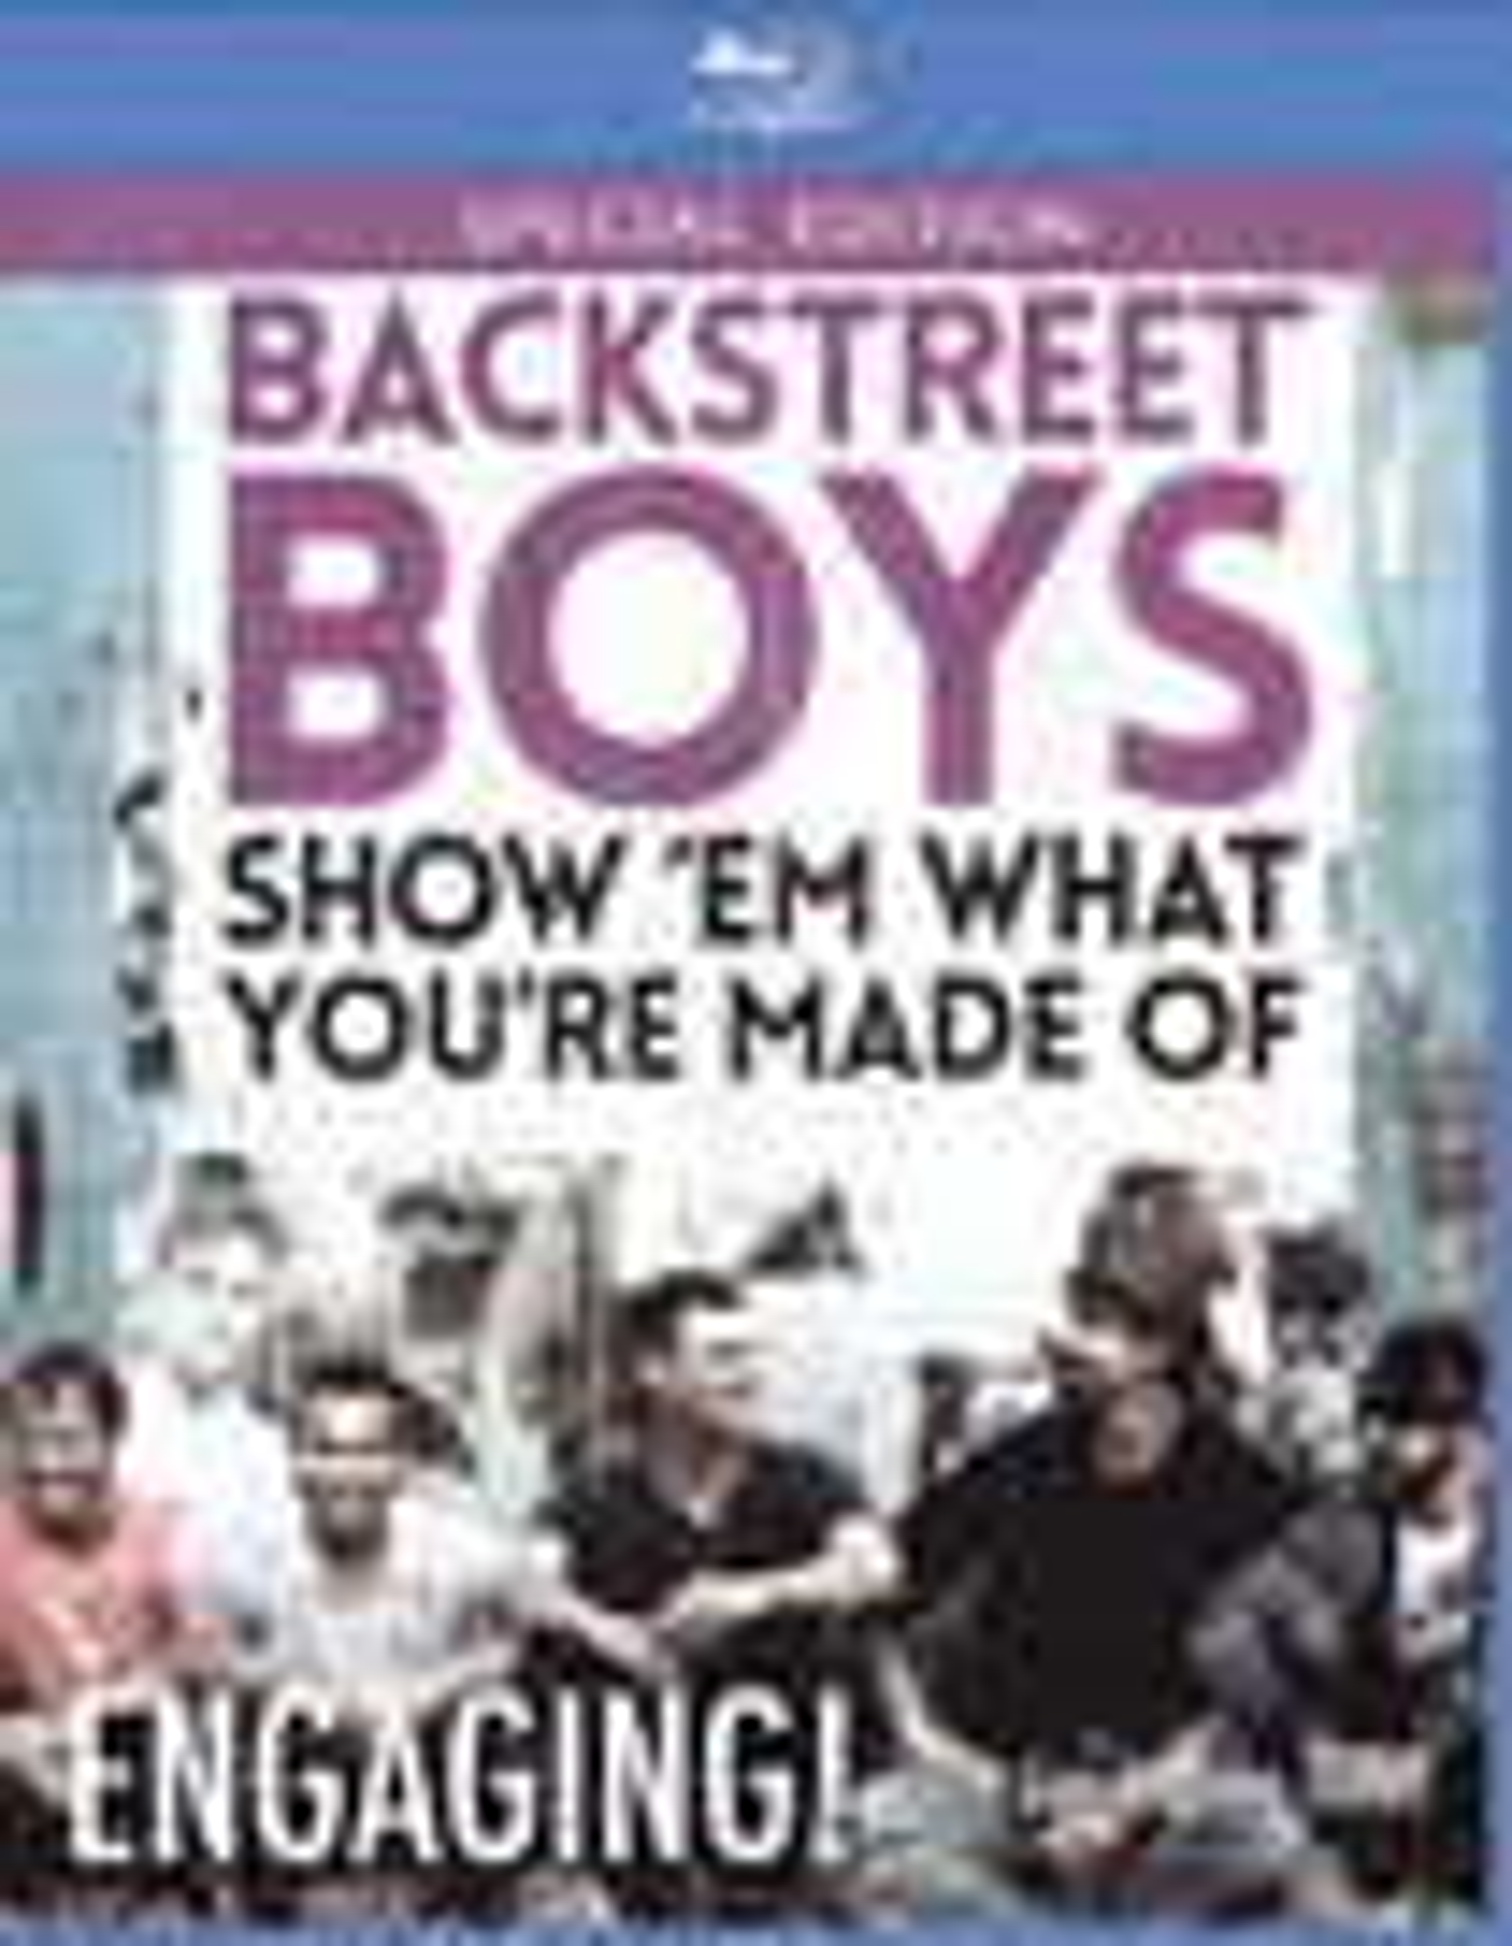 Backstreet Boys: Show Em What You're Made Of [blu-ray] [2015] 28355414